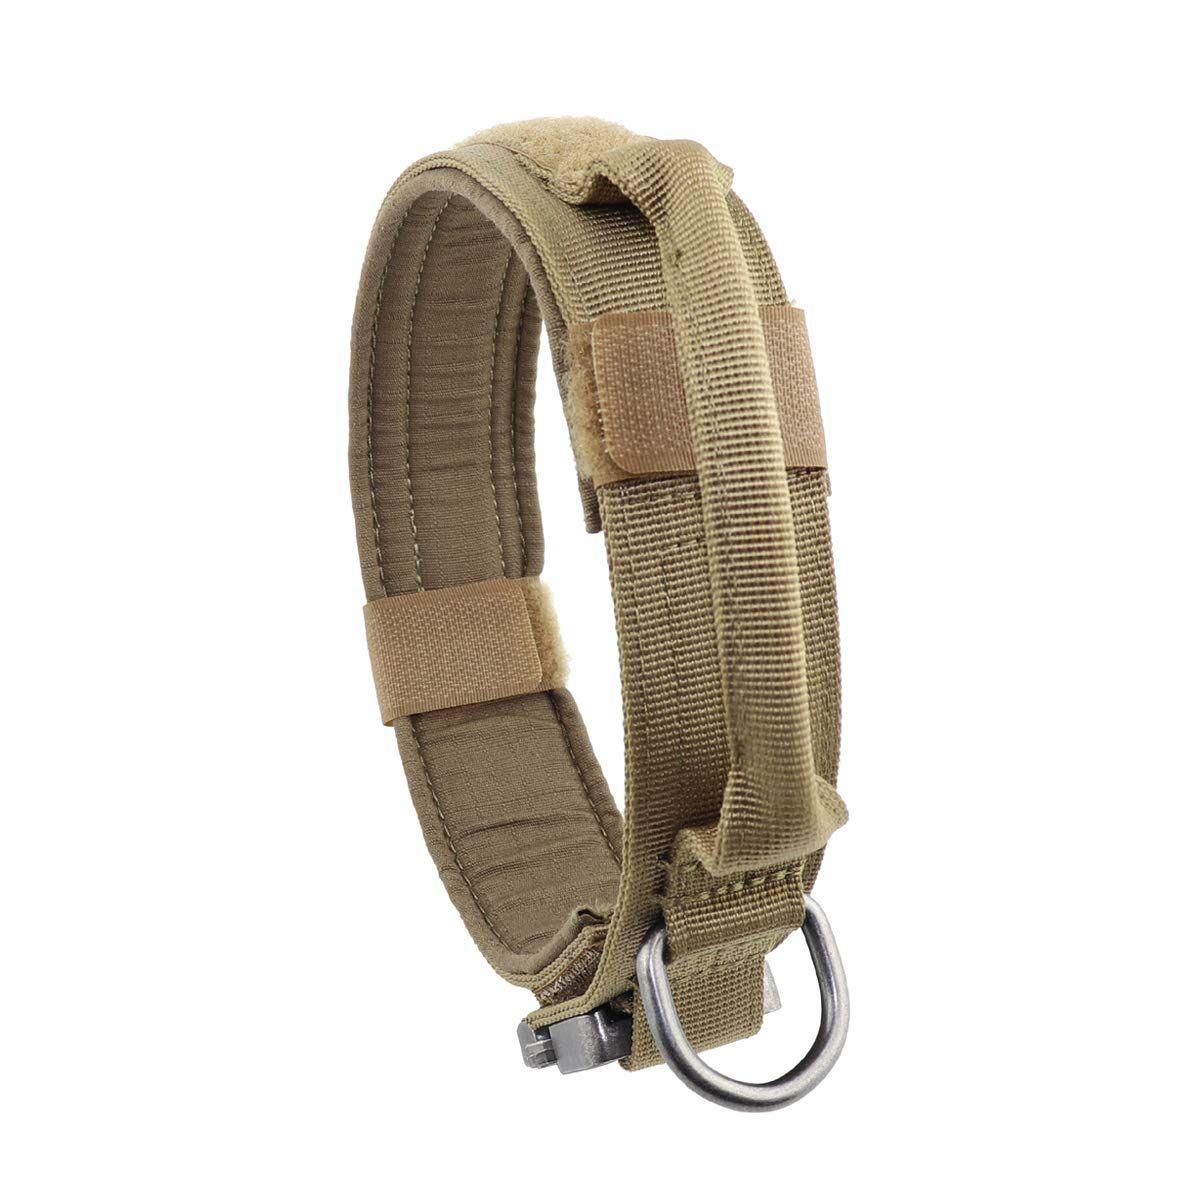 K9 Nylon Military Tactical Adjustable Dog Collar Pet Training Leash Metal Buckle